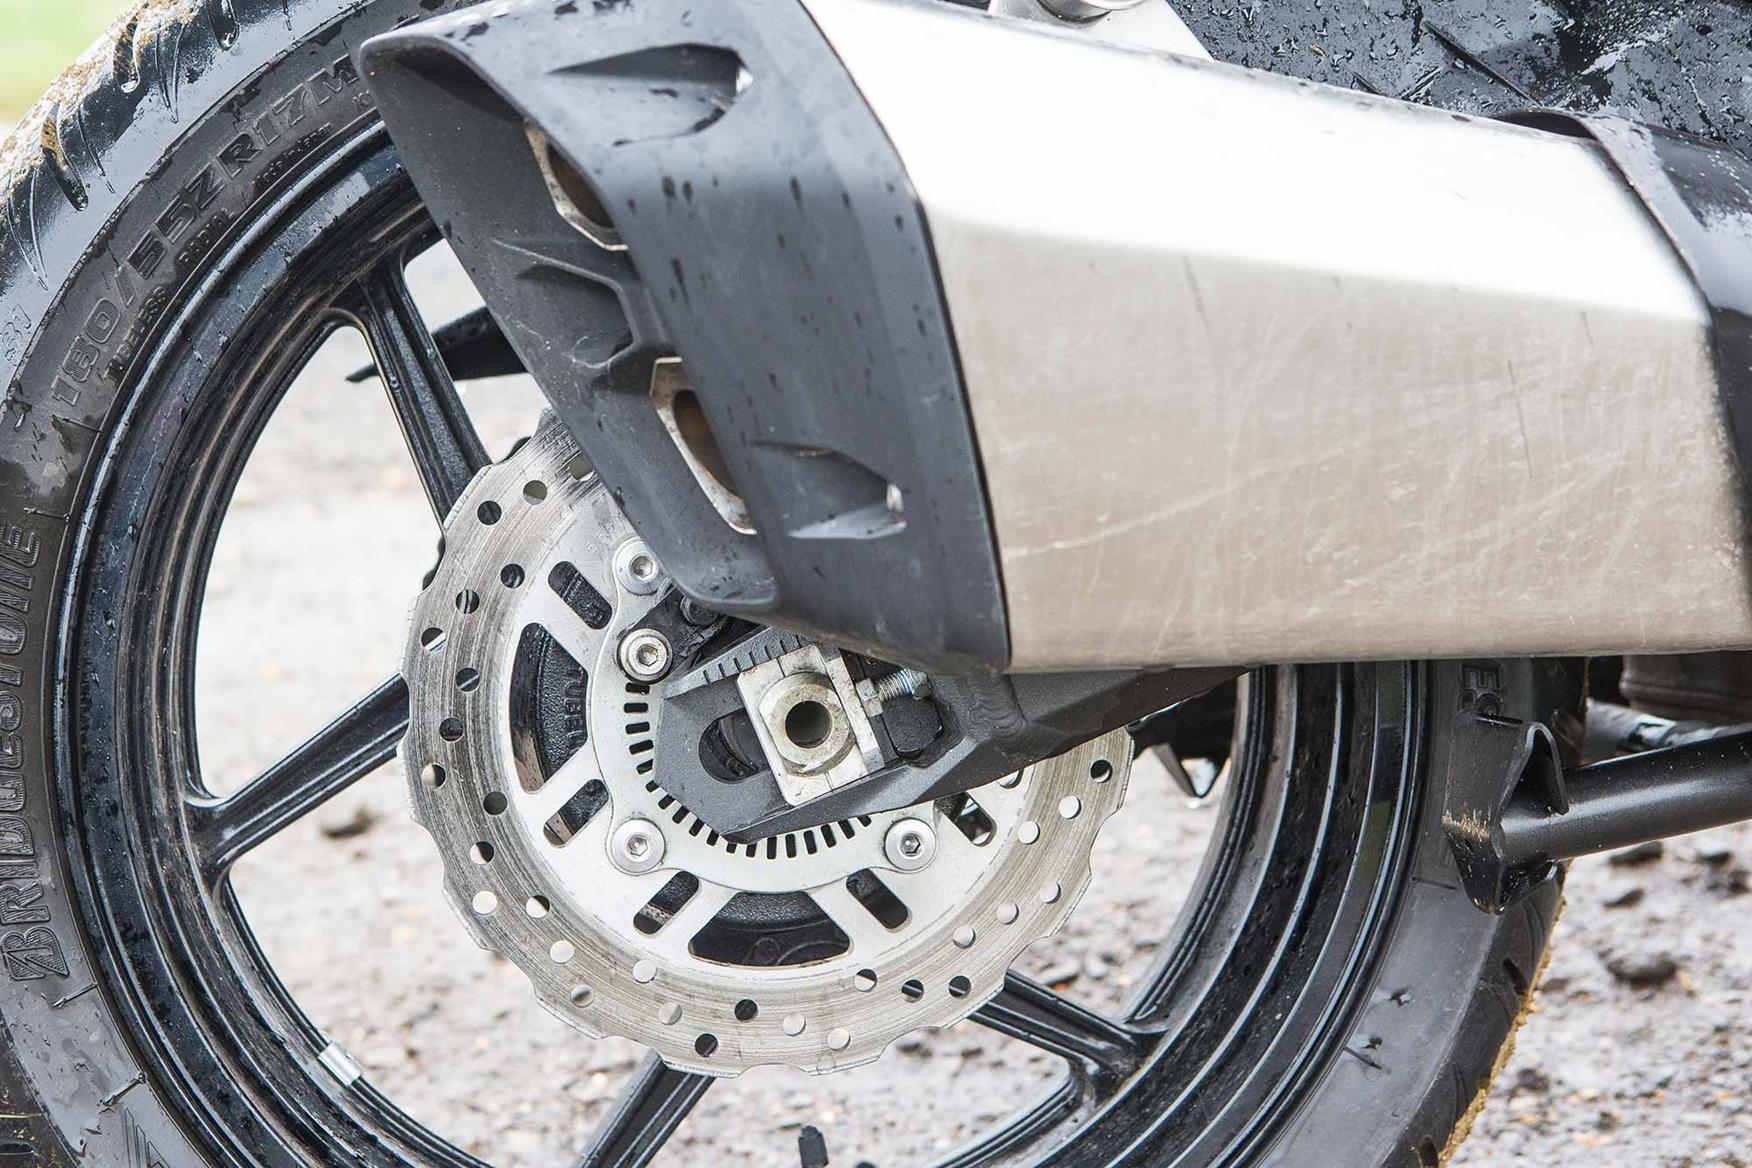 Kawasaki Versys 1000 SE exhaust can